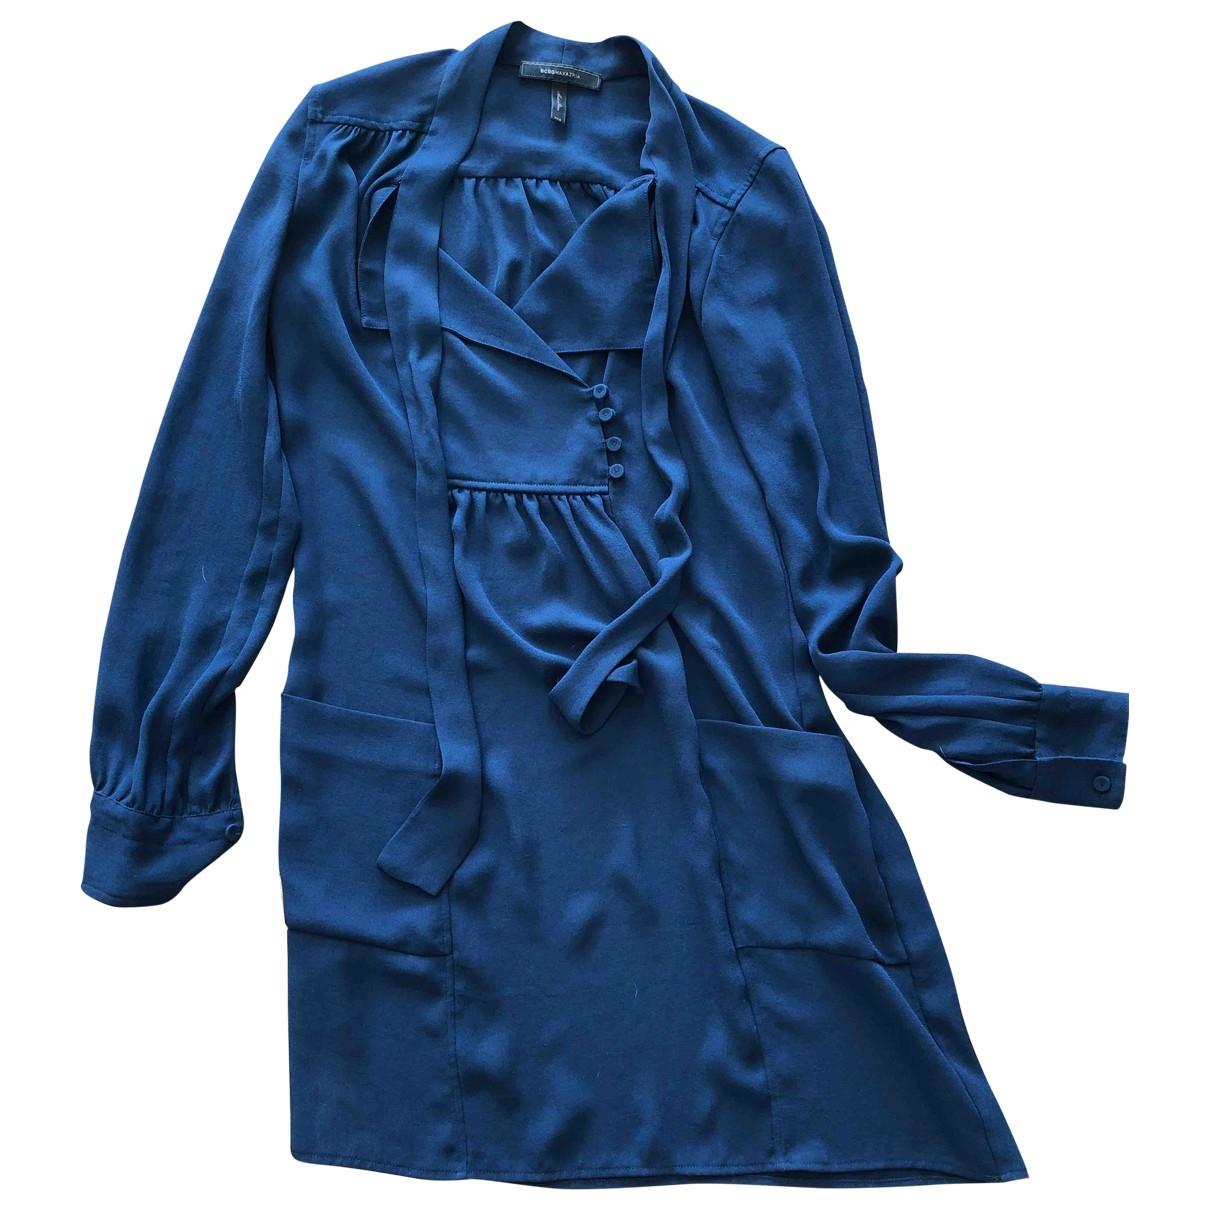 Bcbg Max Azria \N Kleid in  Marine Polyester